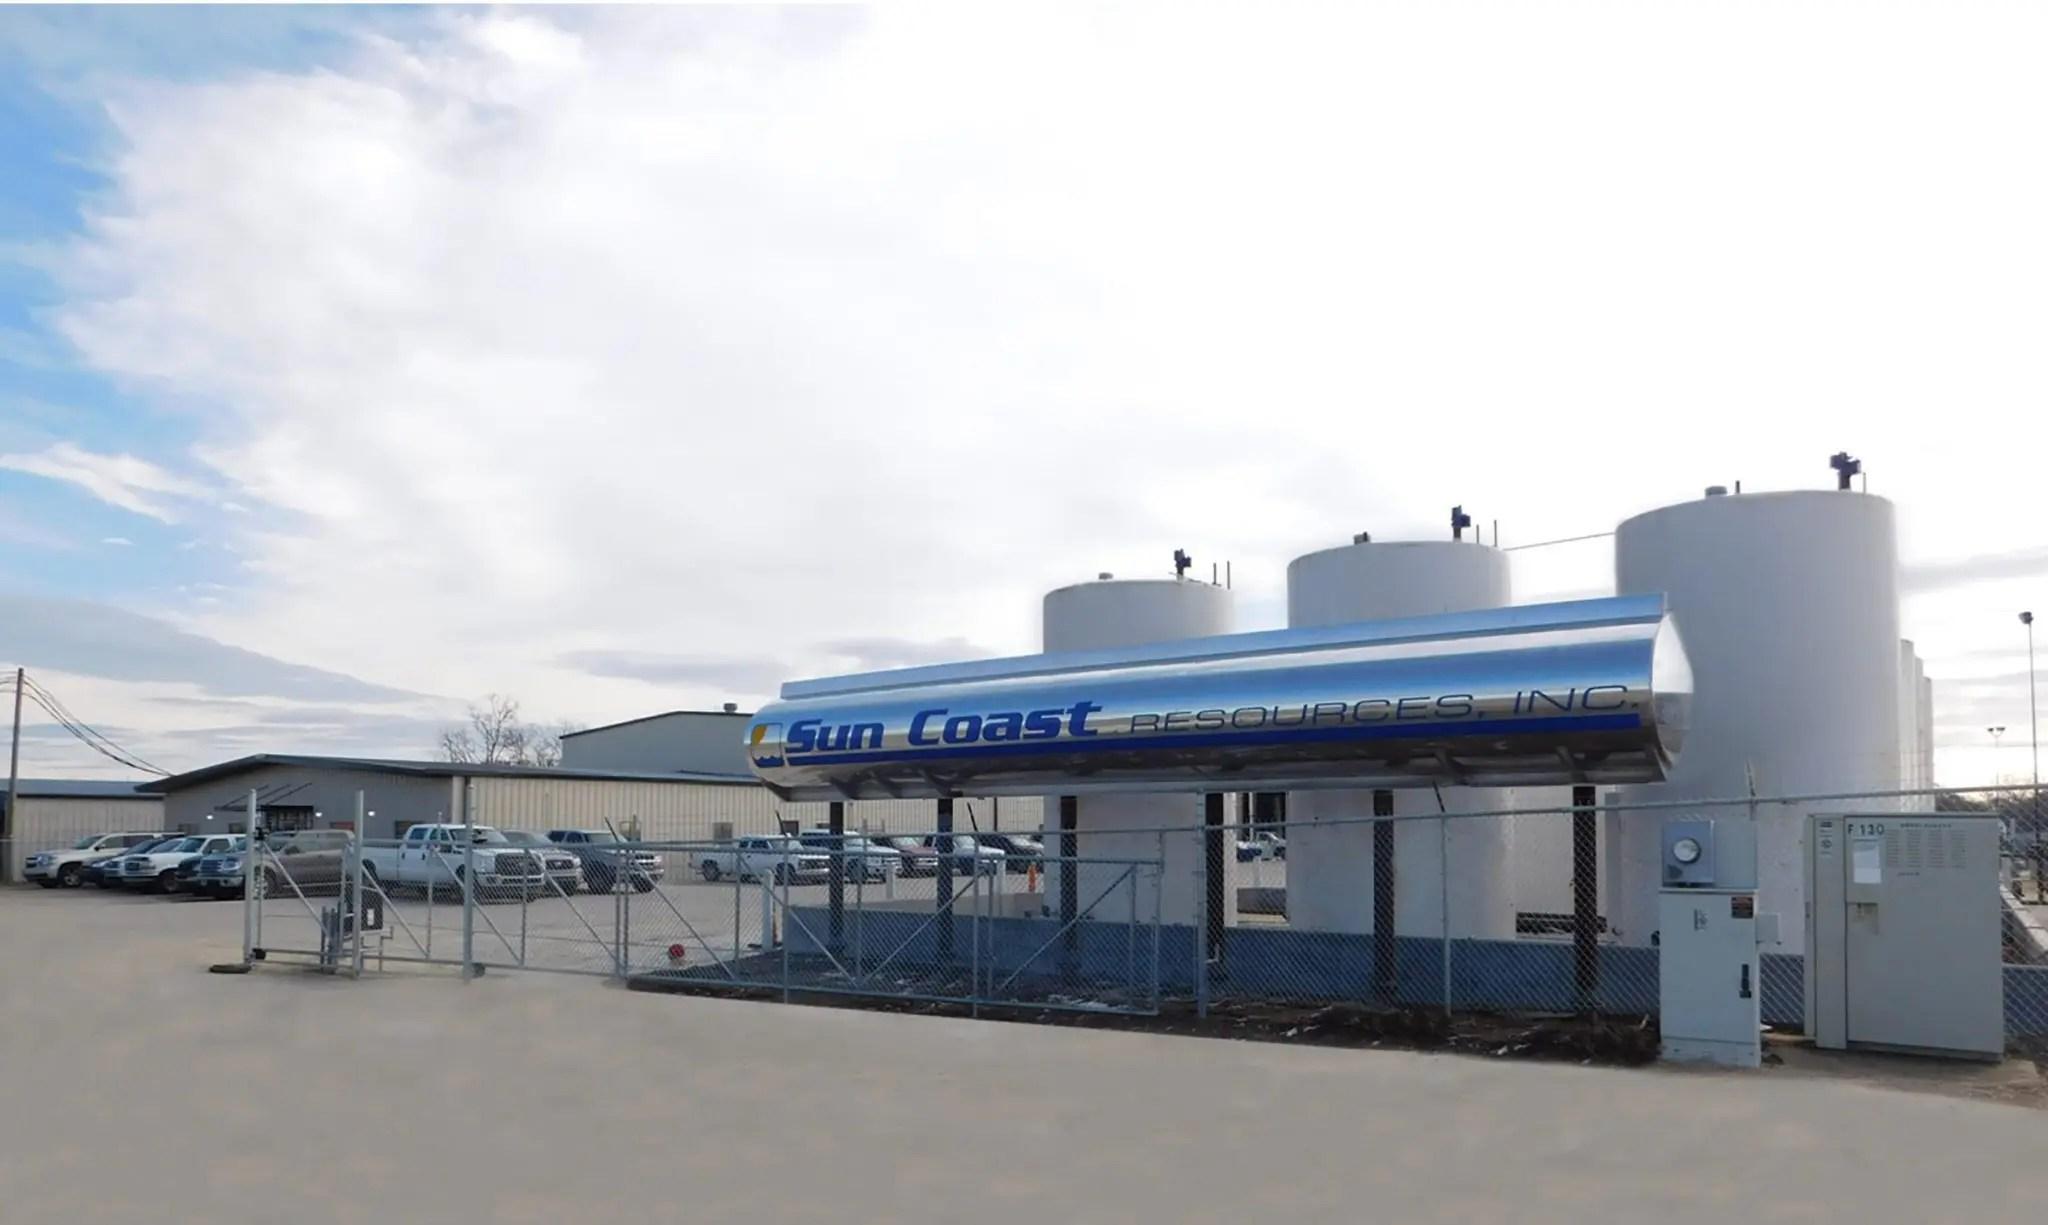 Sun Coast Resources Inc. opens new Broussard, Louisiana facility